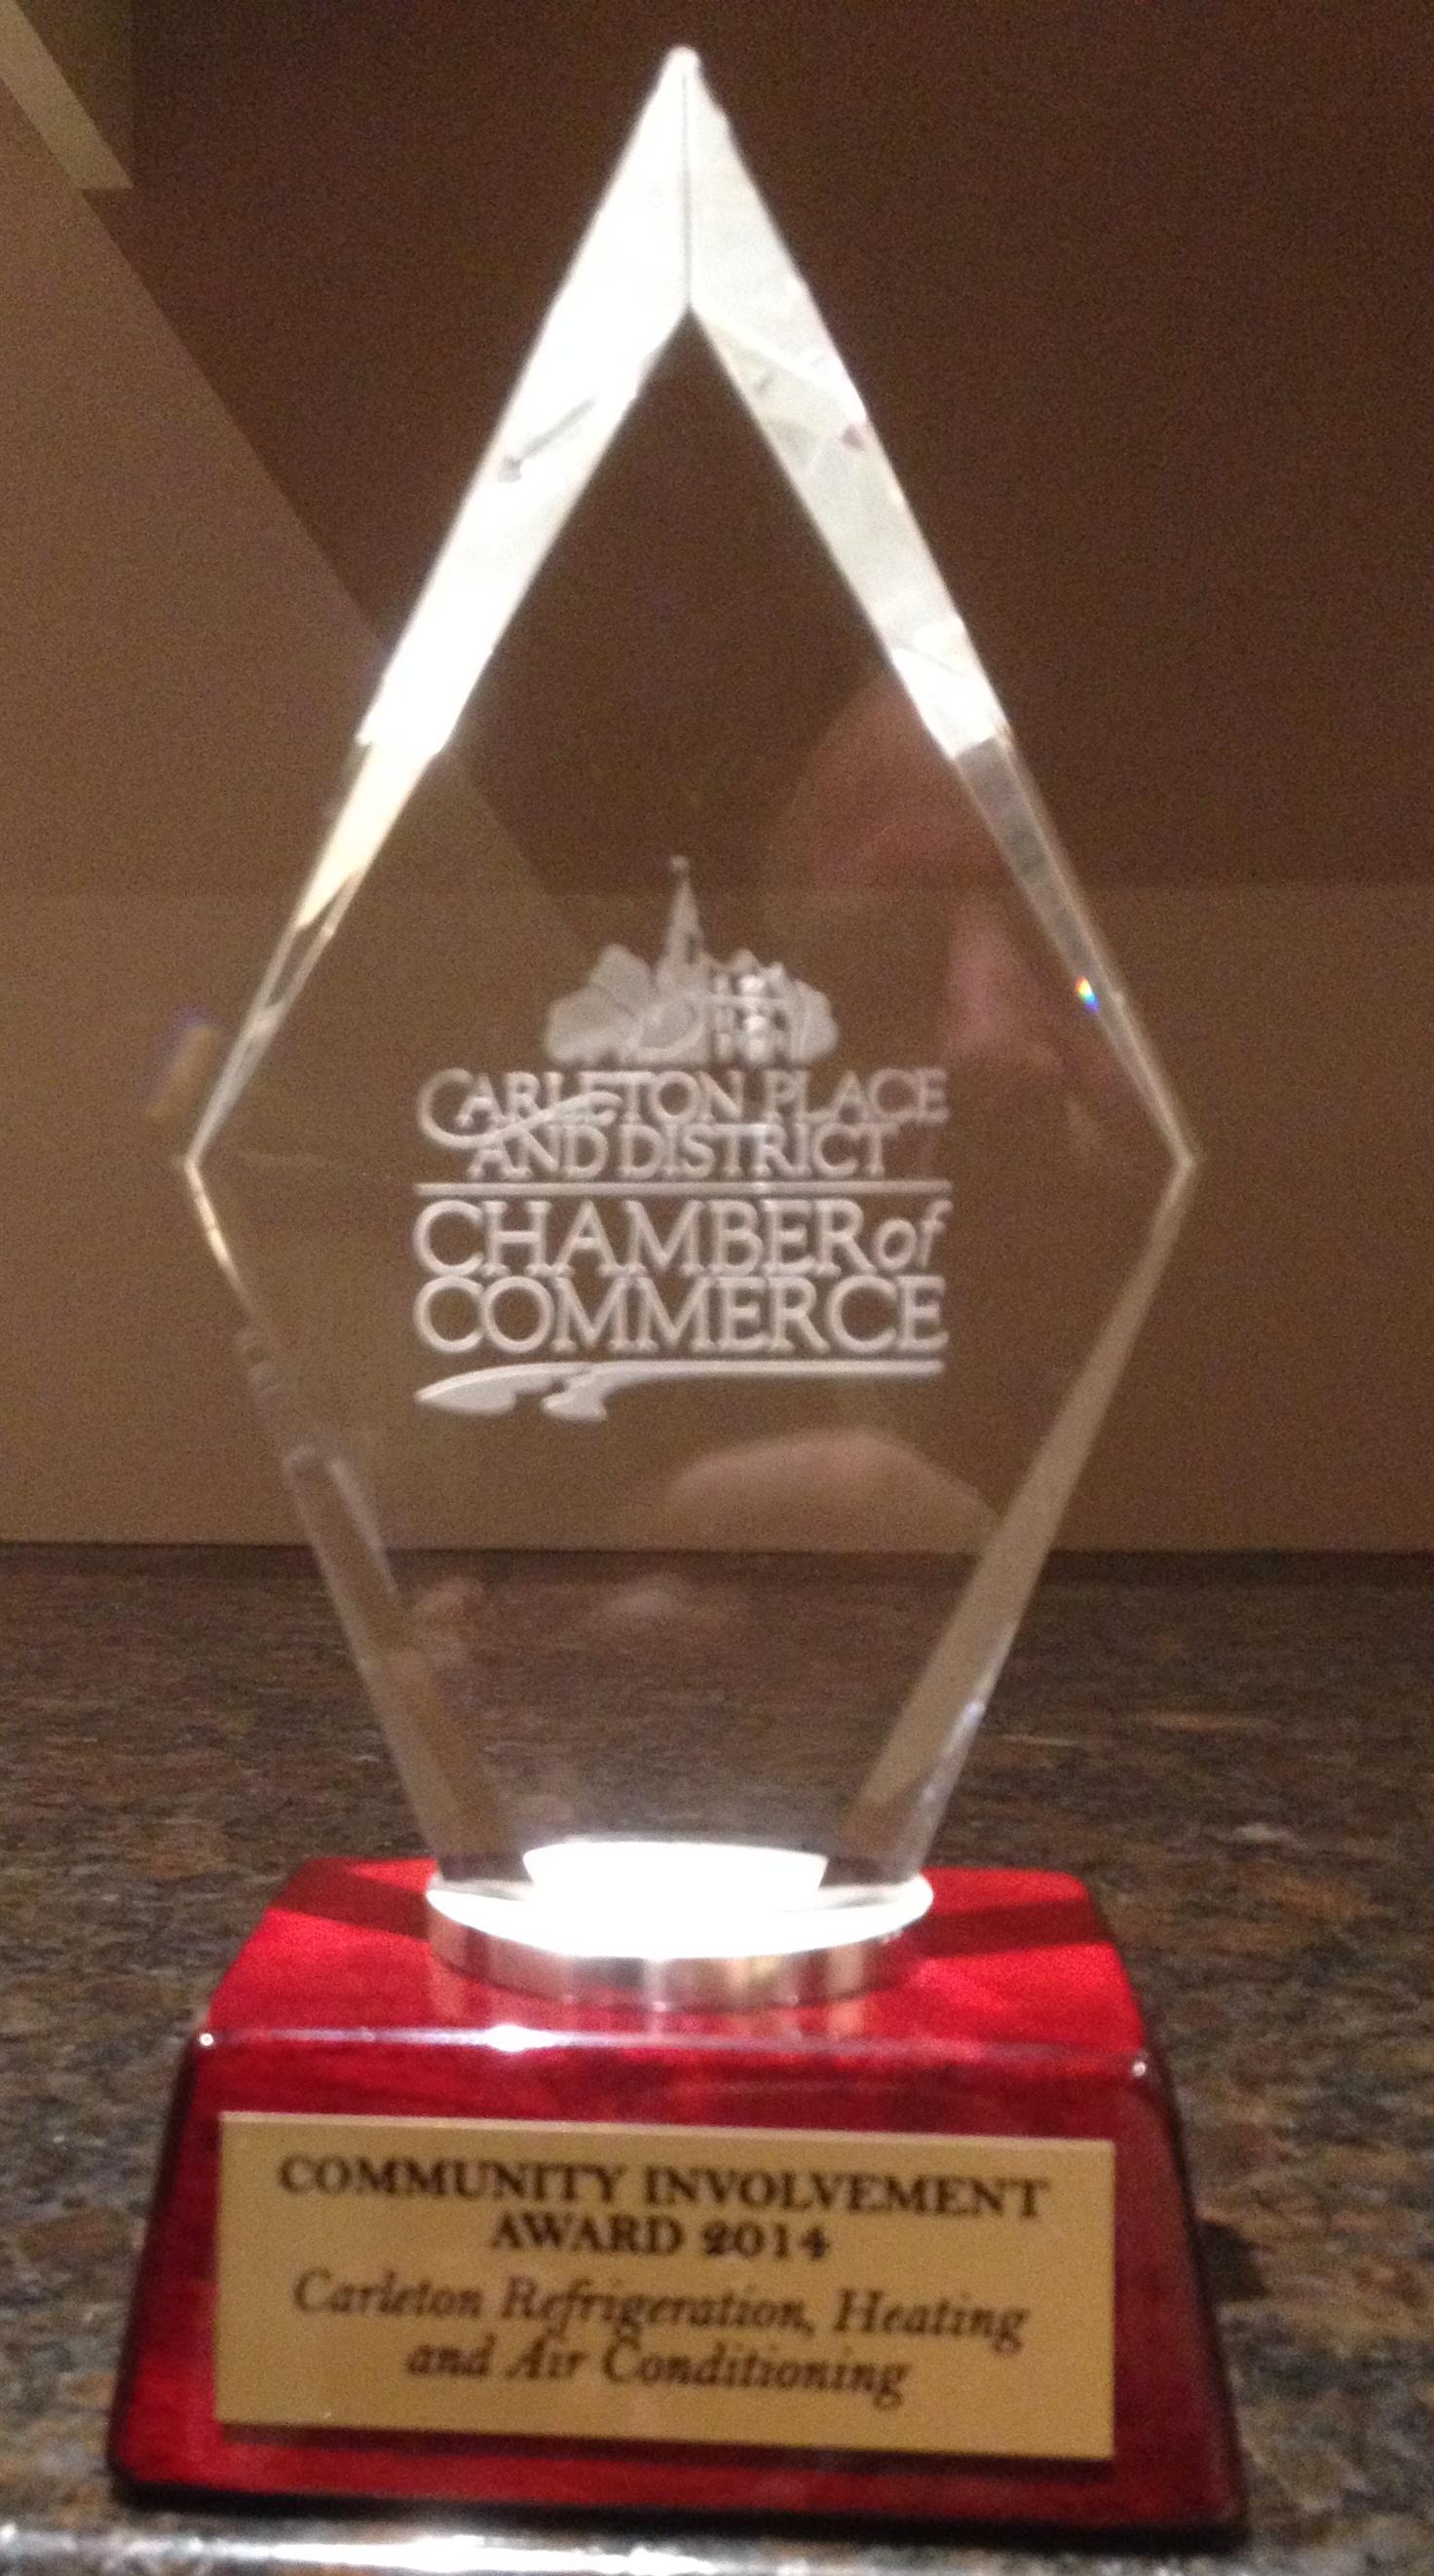 Community Involvement Award 2014